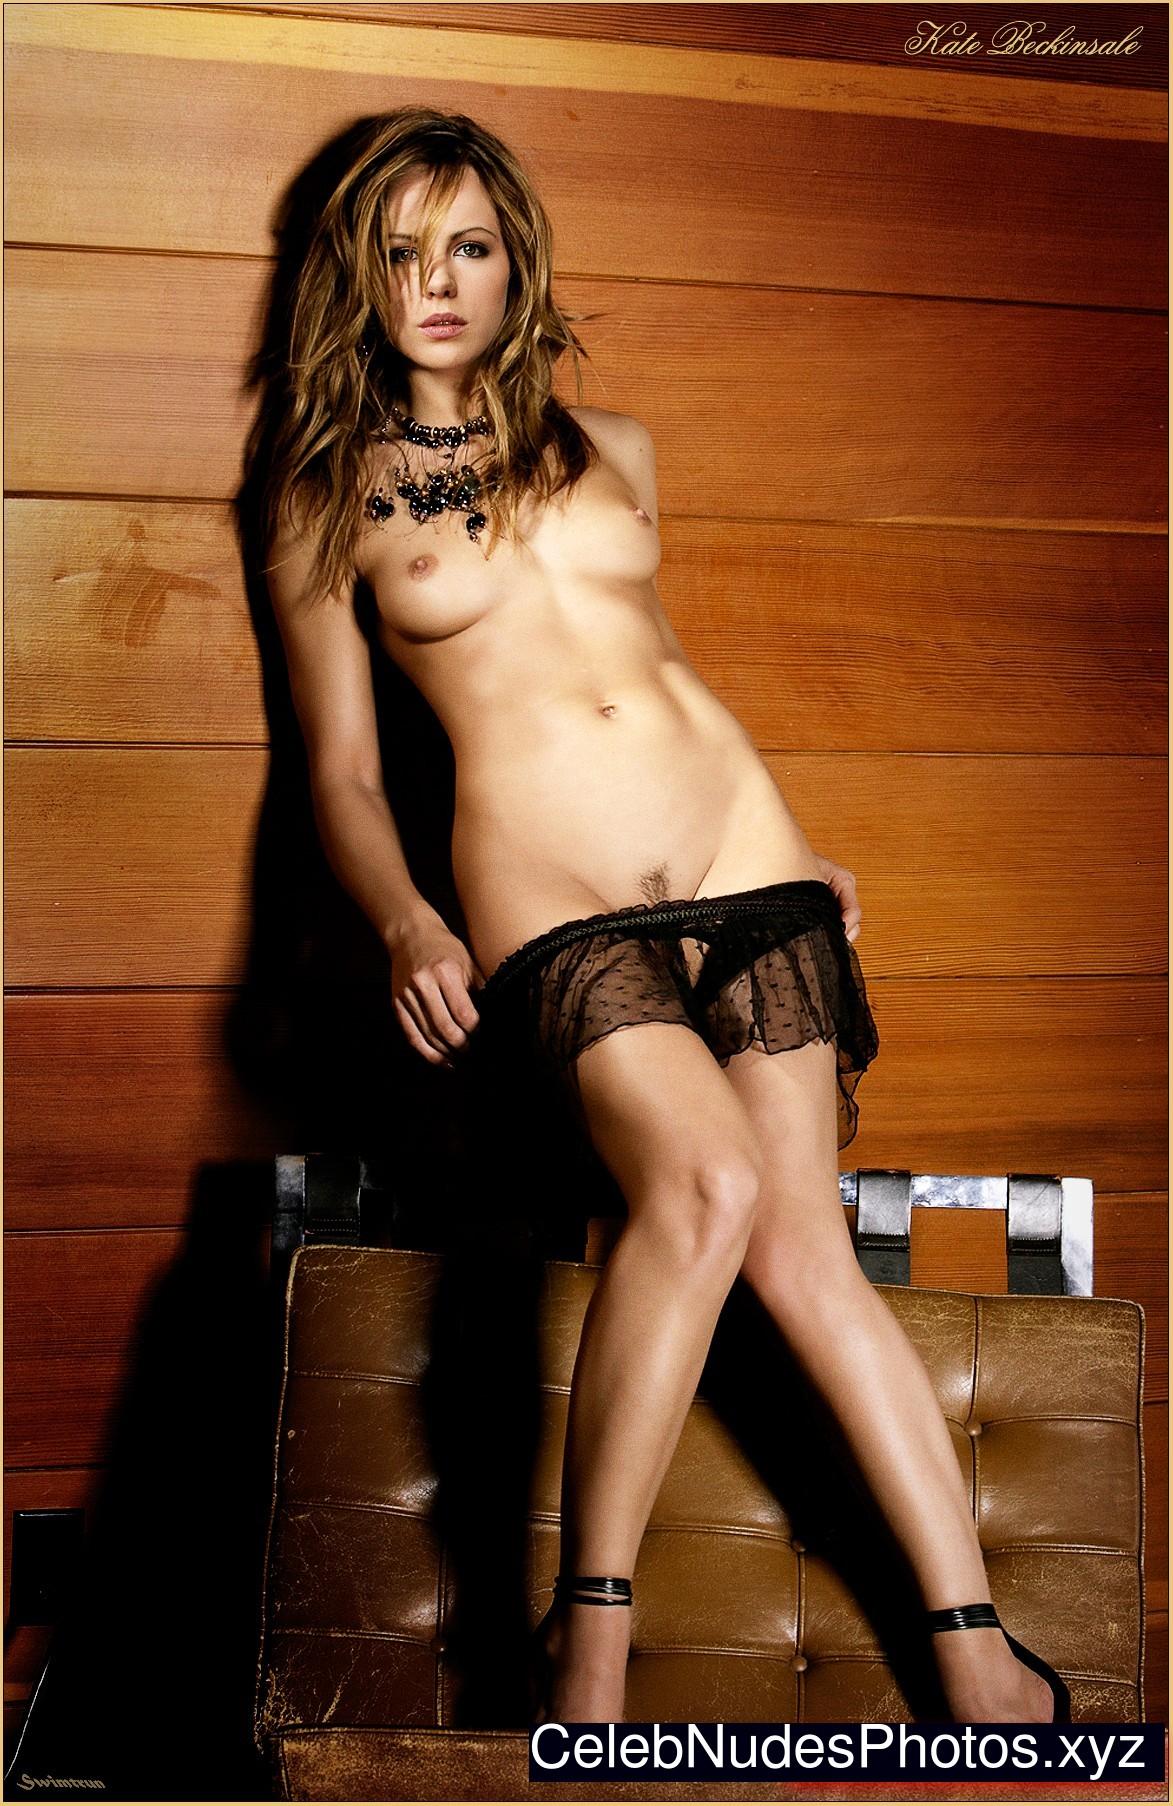 Kate Beckinsale Hot Nude Pics